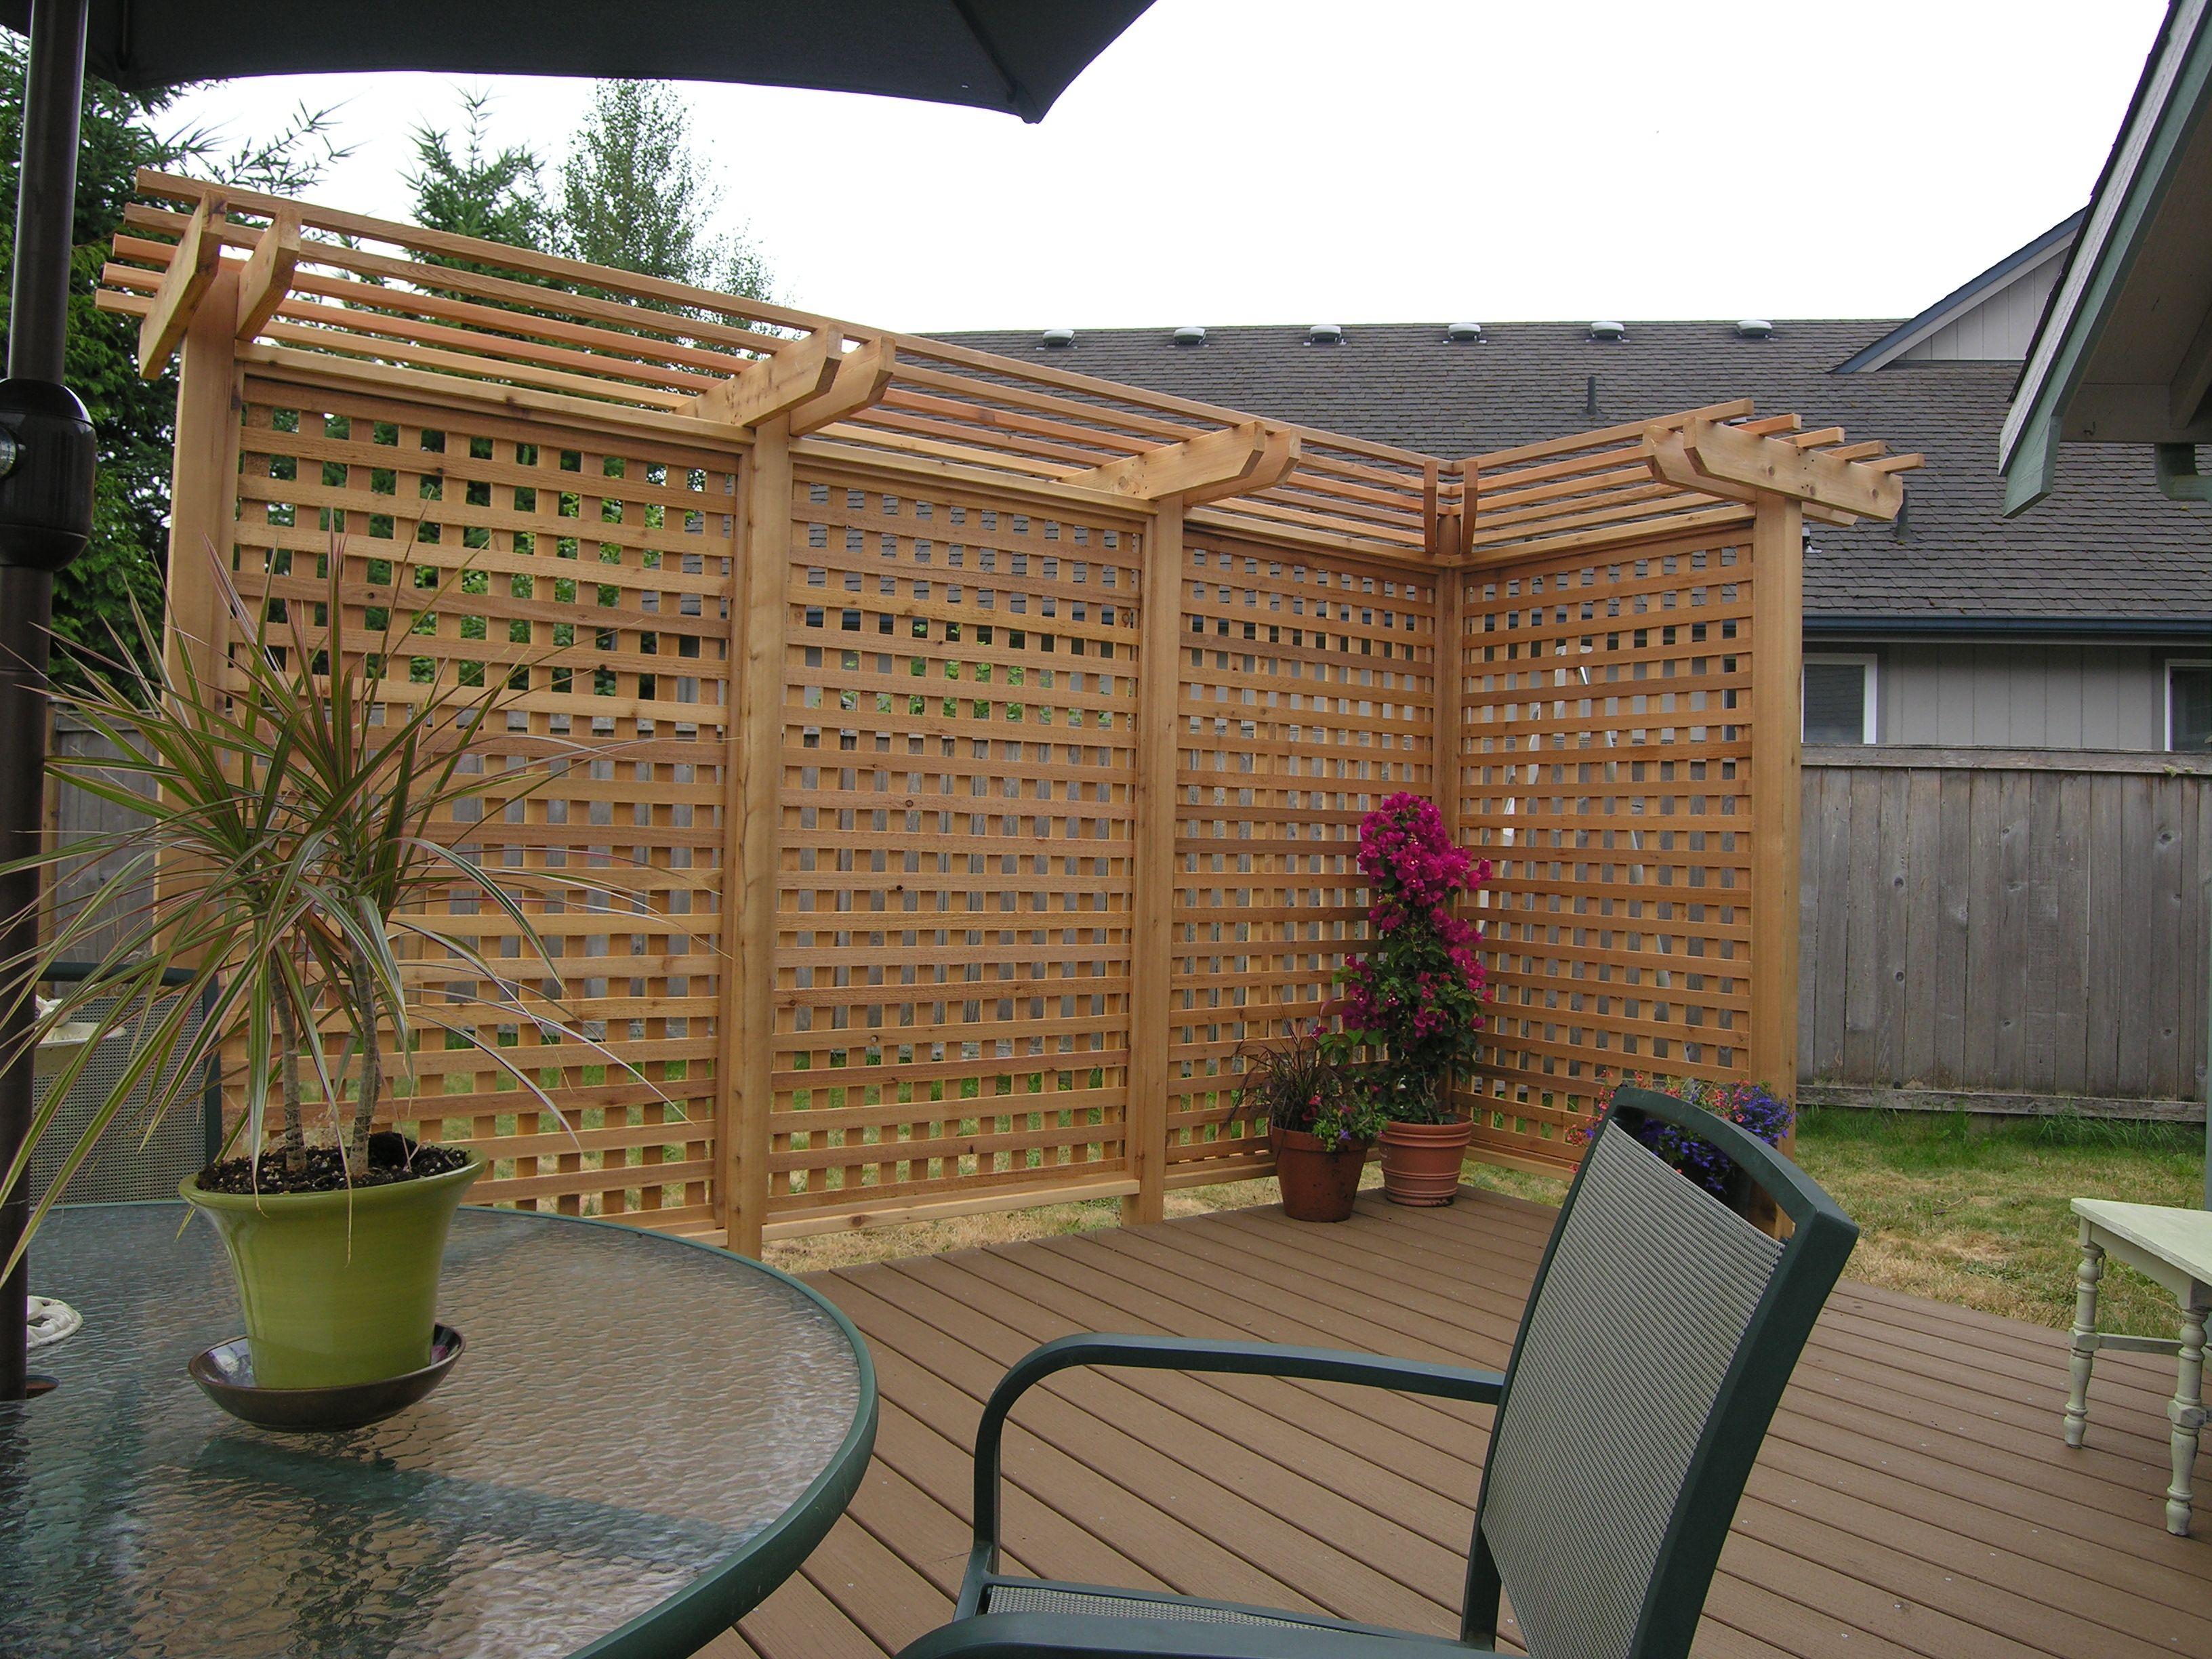 Home Decor: Backyard Deck Ideas Deck Privacy Fence Eas ...